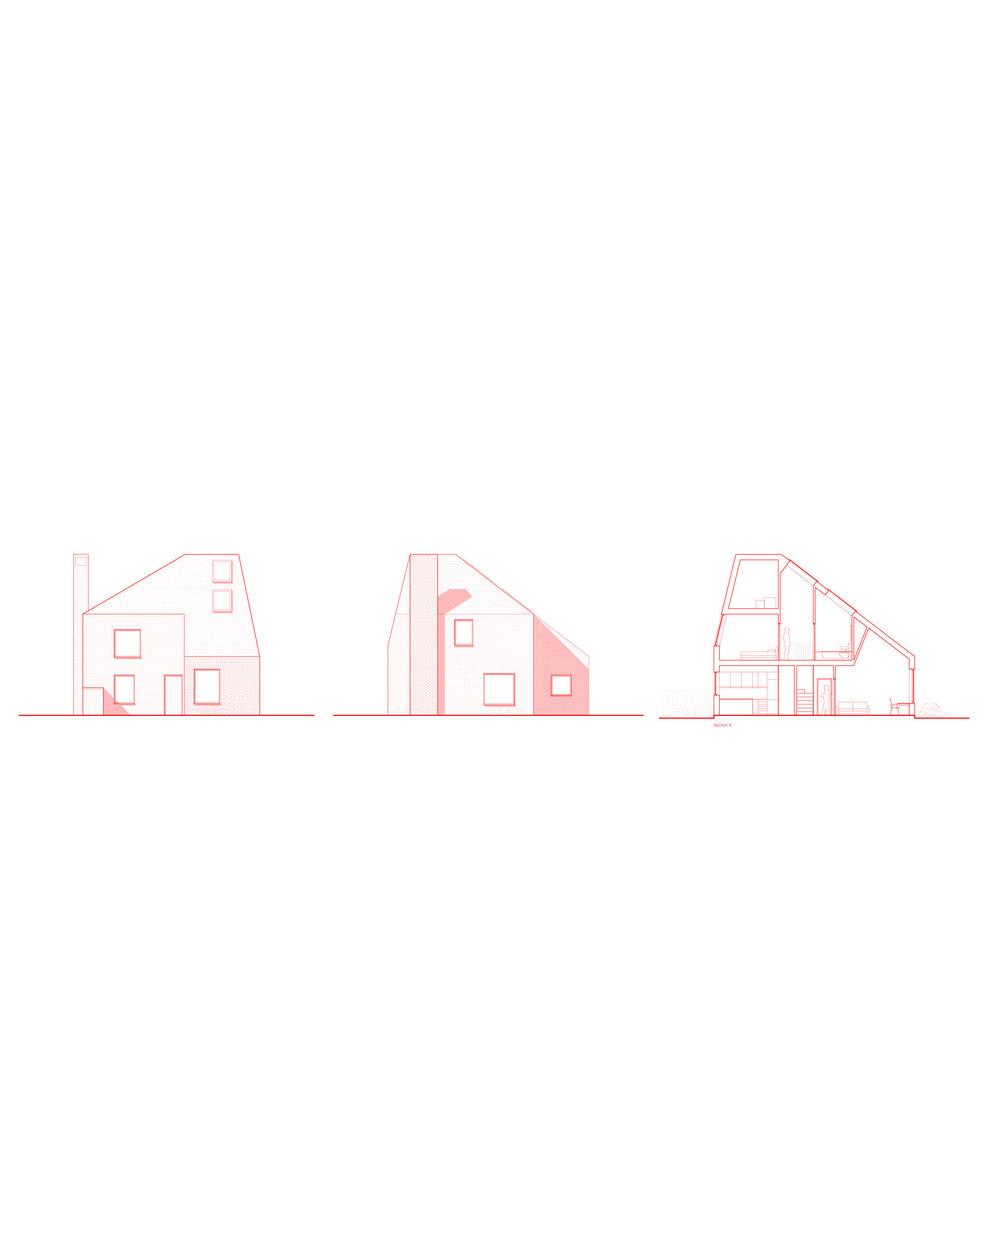 HOUSE TYPE PLANS2.jpg